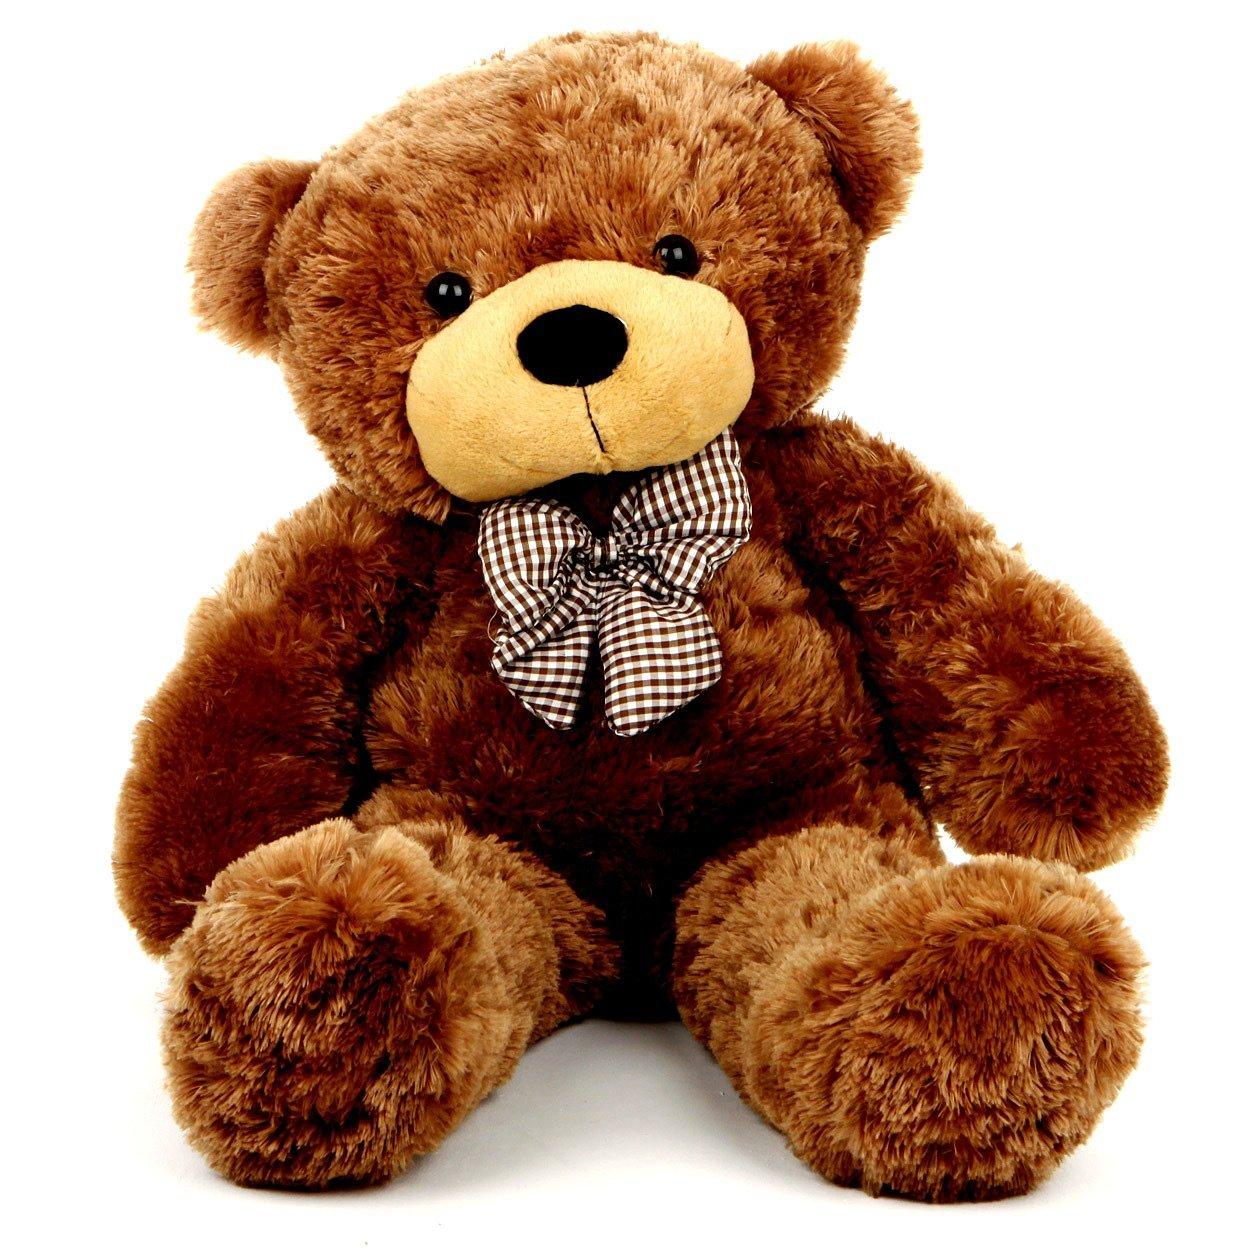 Soft Toy, Teddy Bear, Grabadeal